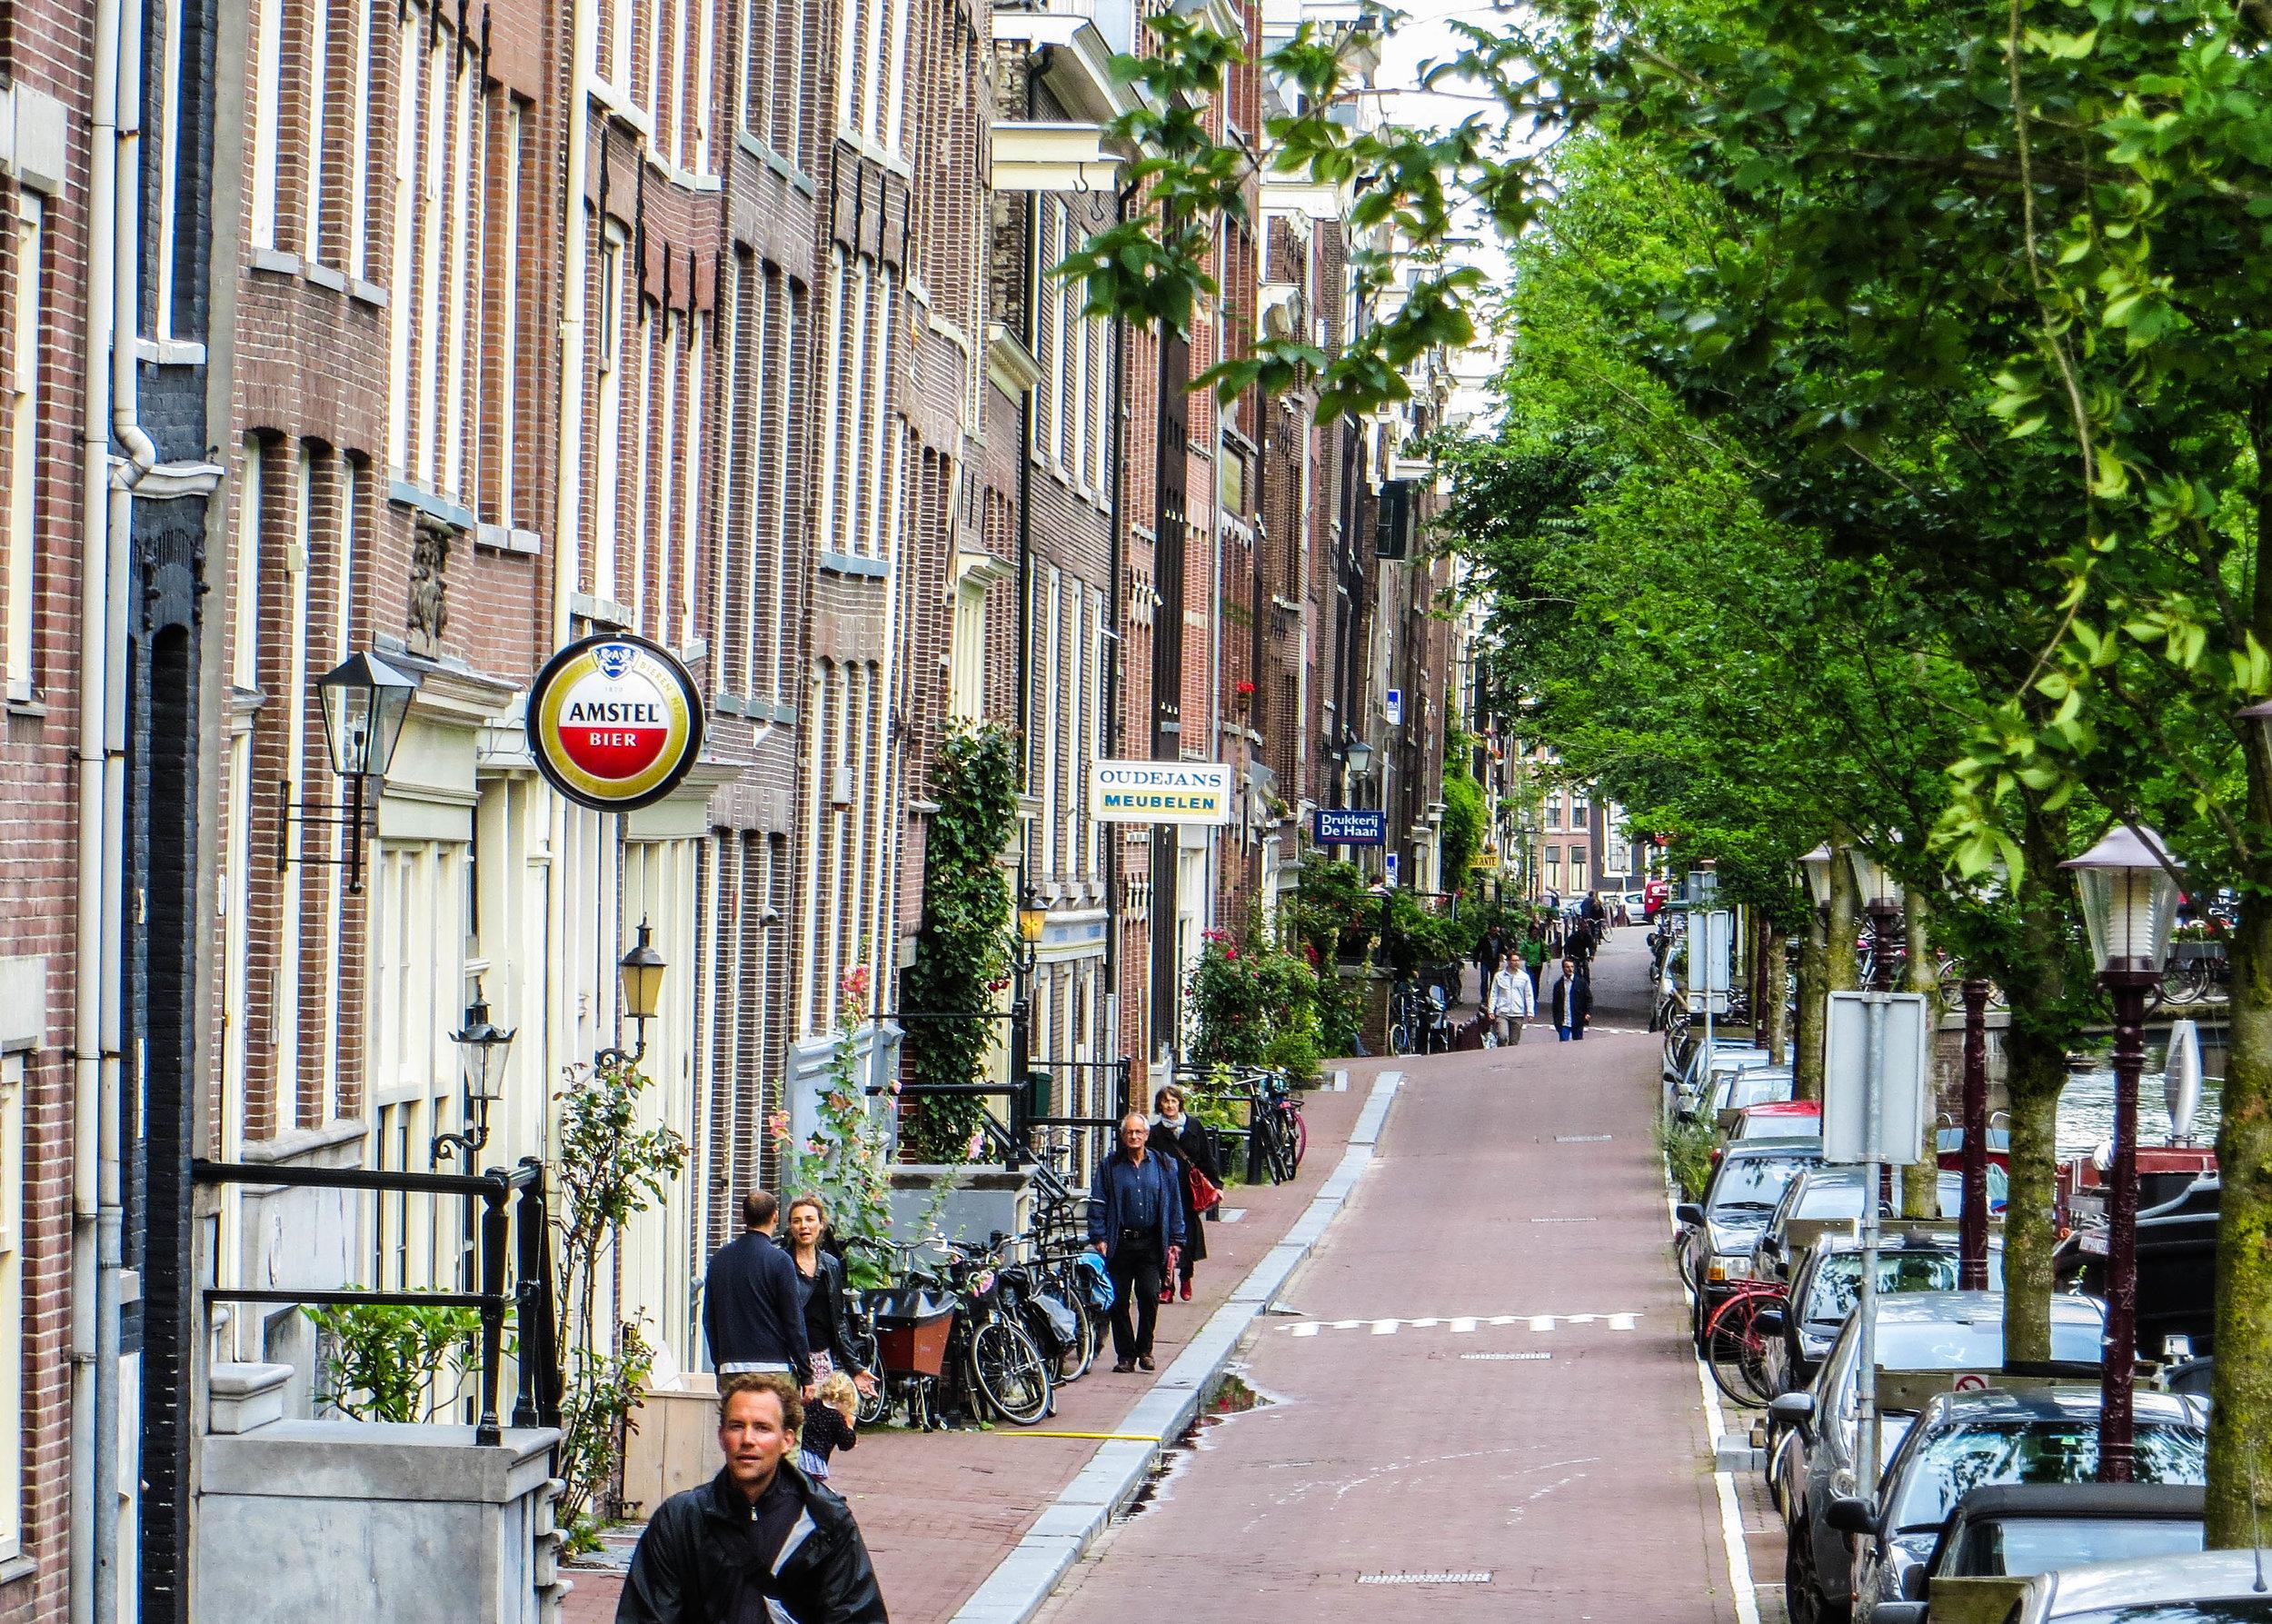 amsterdam-netherlands-street-photography-4-2.jpg